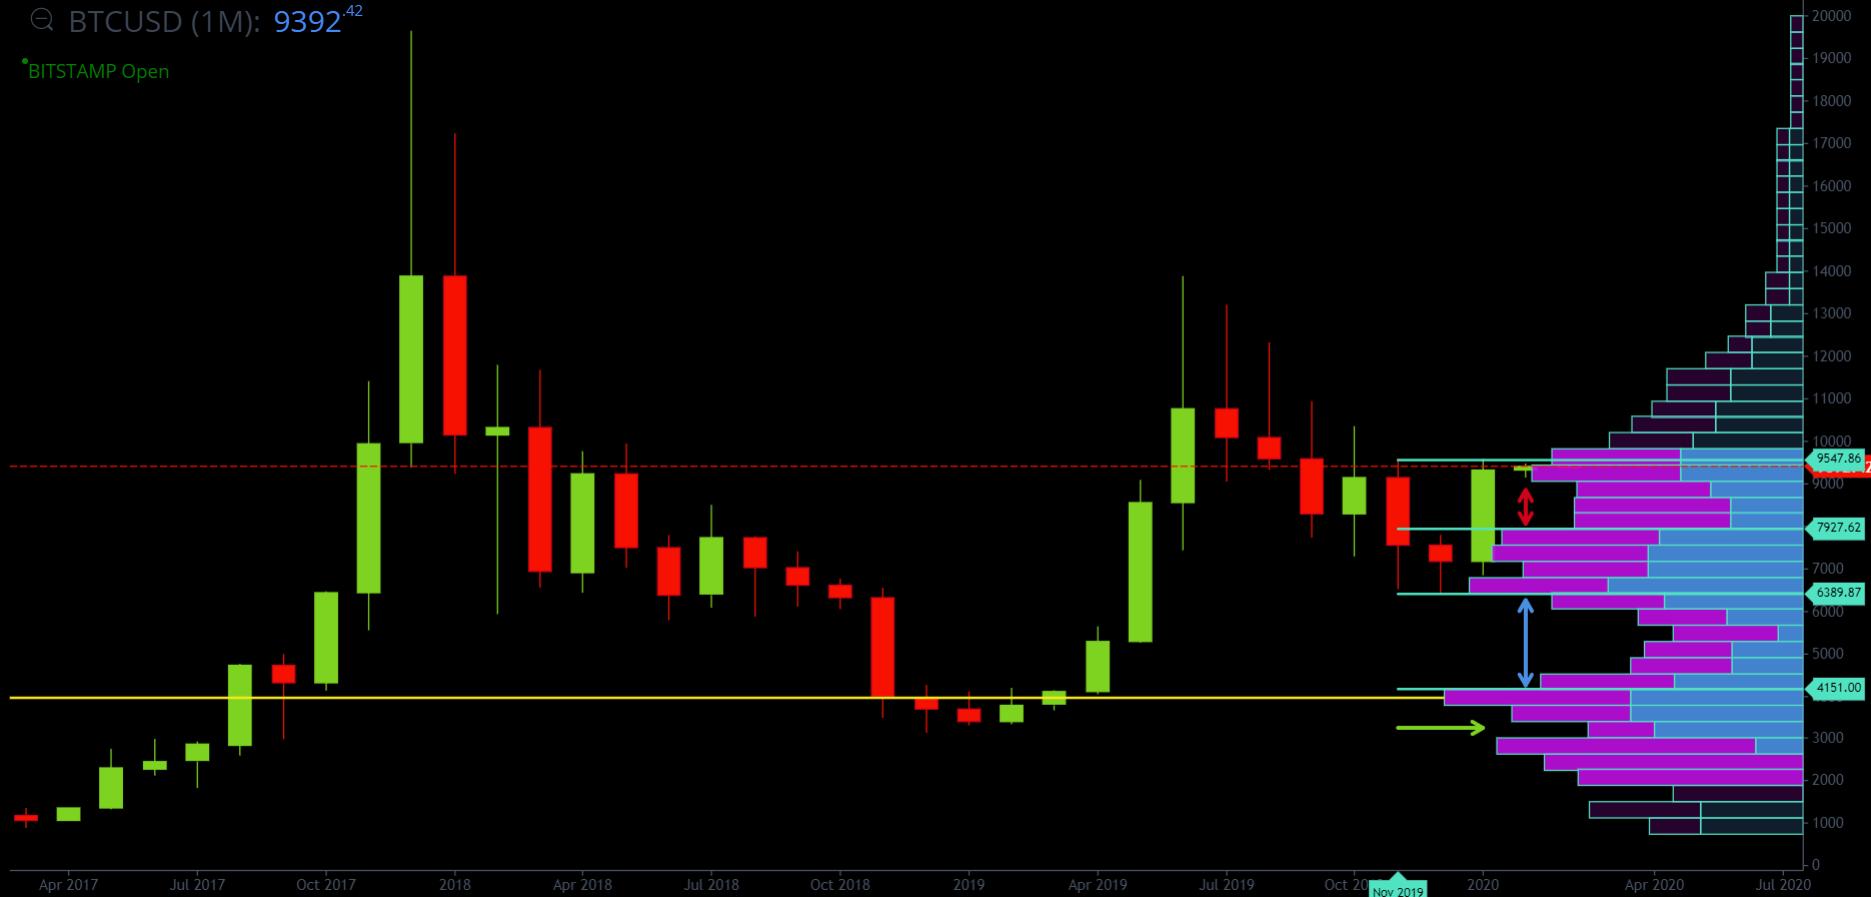 Bitcoin Monthly Volume Profile Analysis